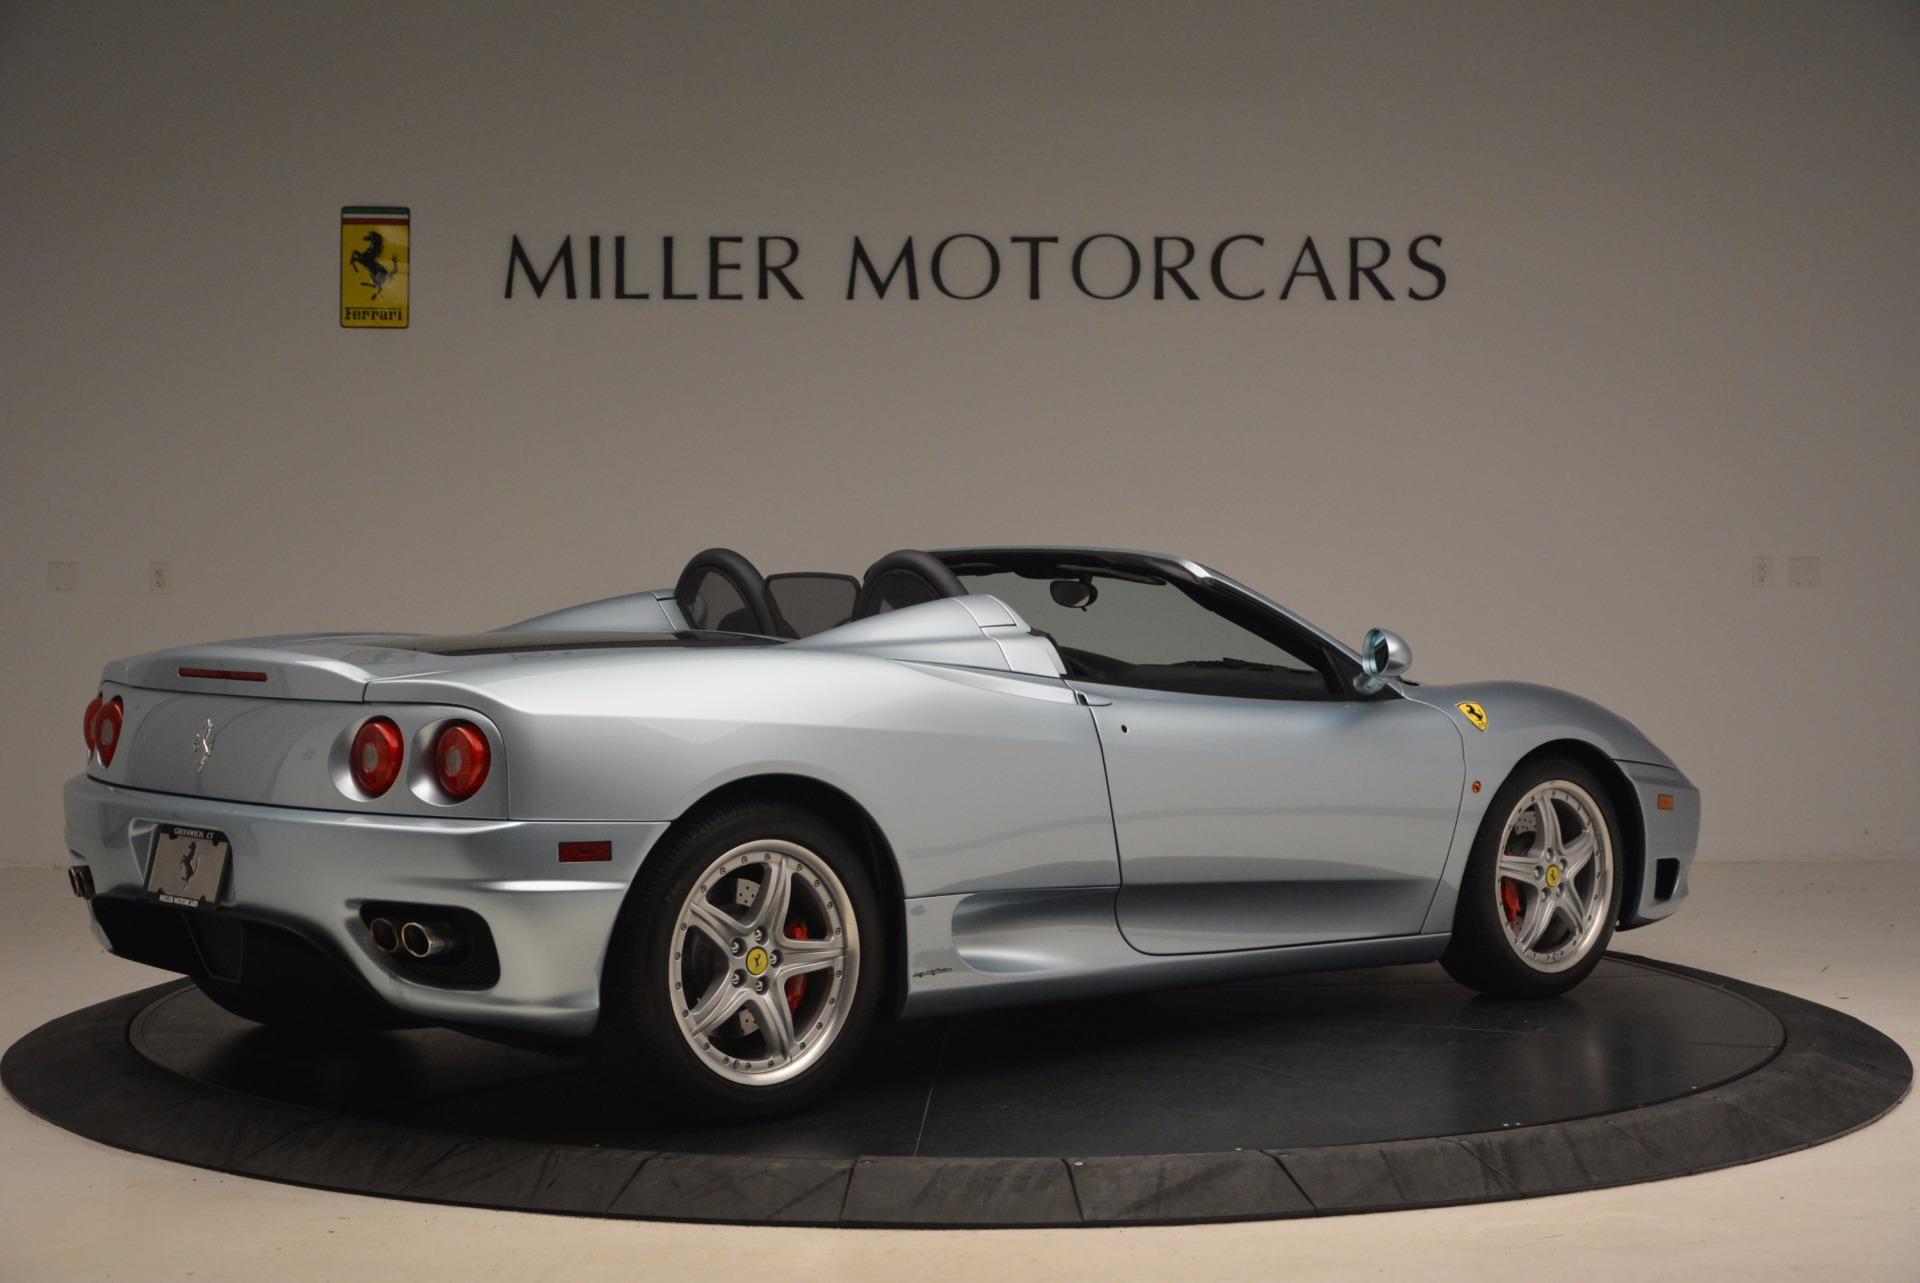 Used 2003 Ferrari 360 Spider 6-Speed Manual For Sale In Westport, CT 1445_p8